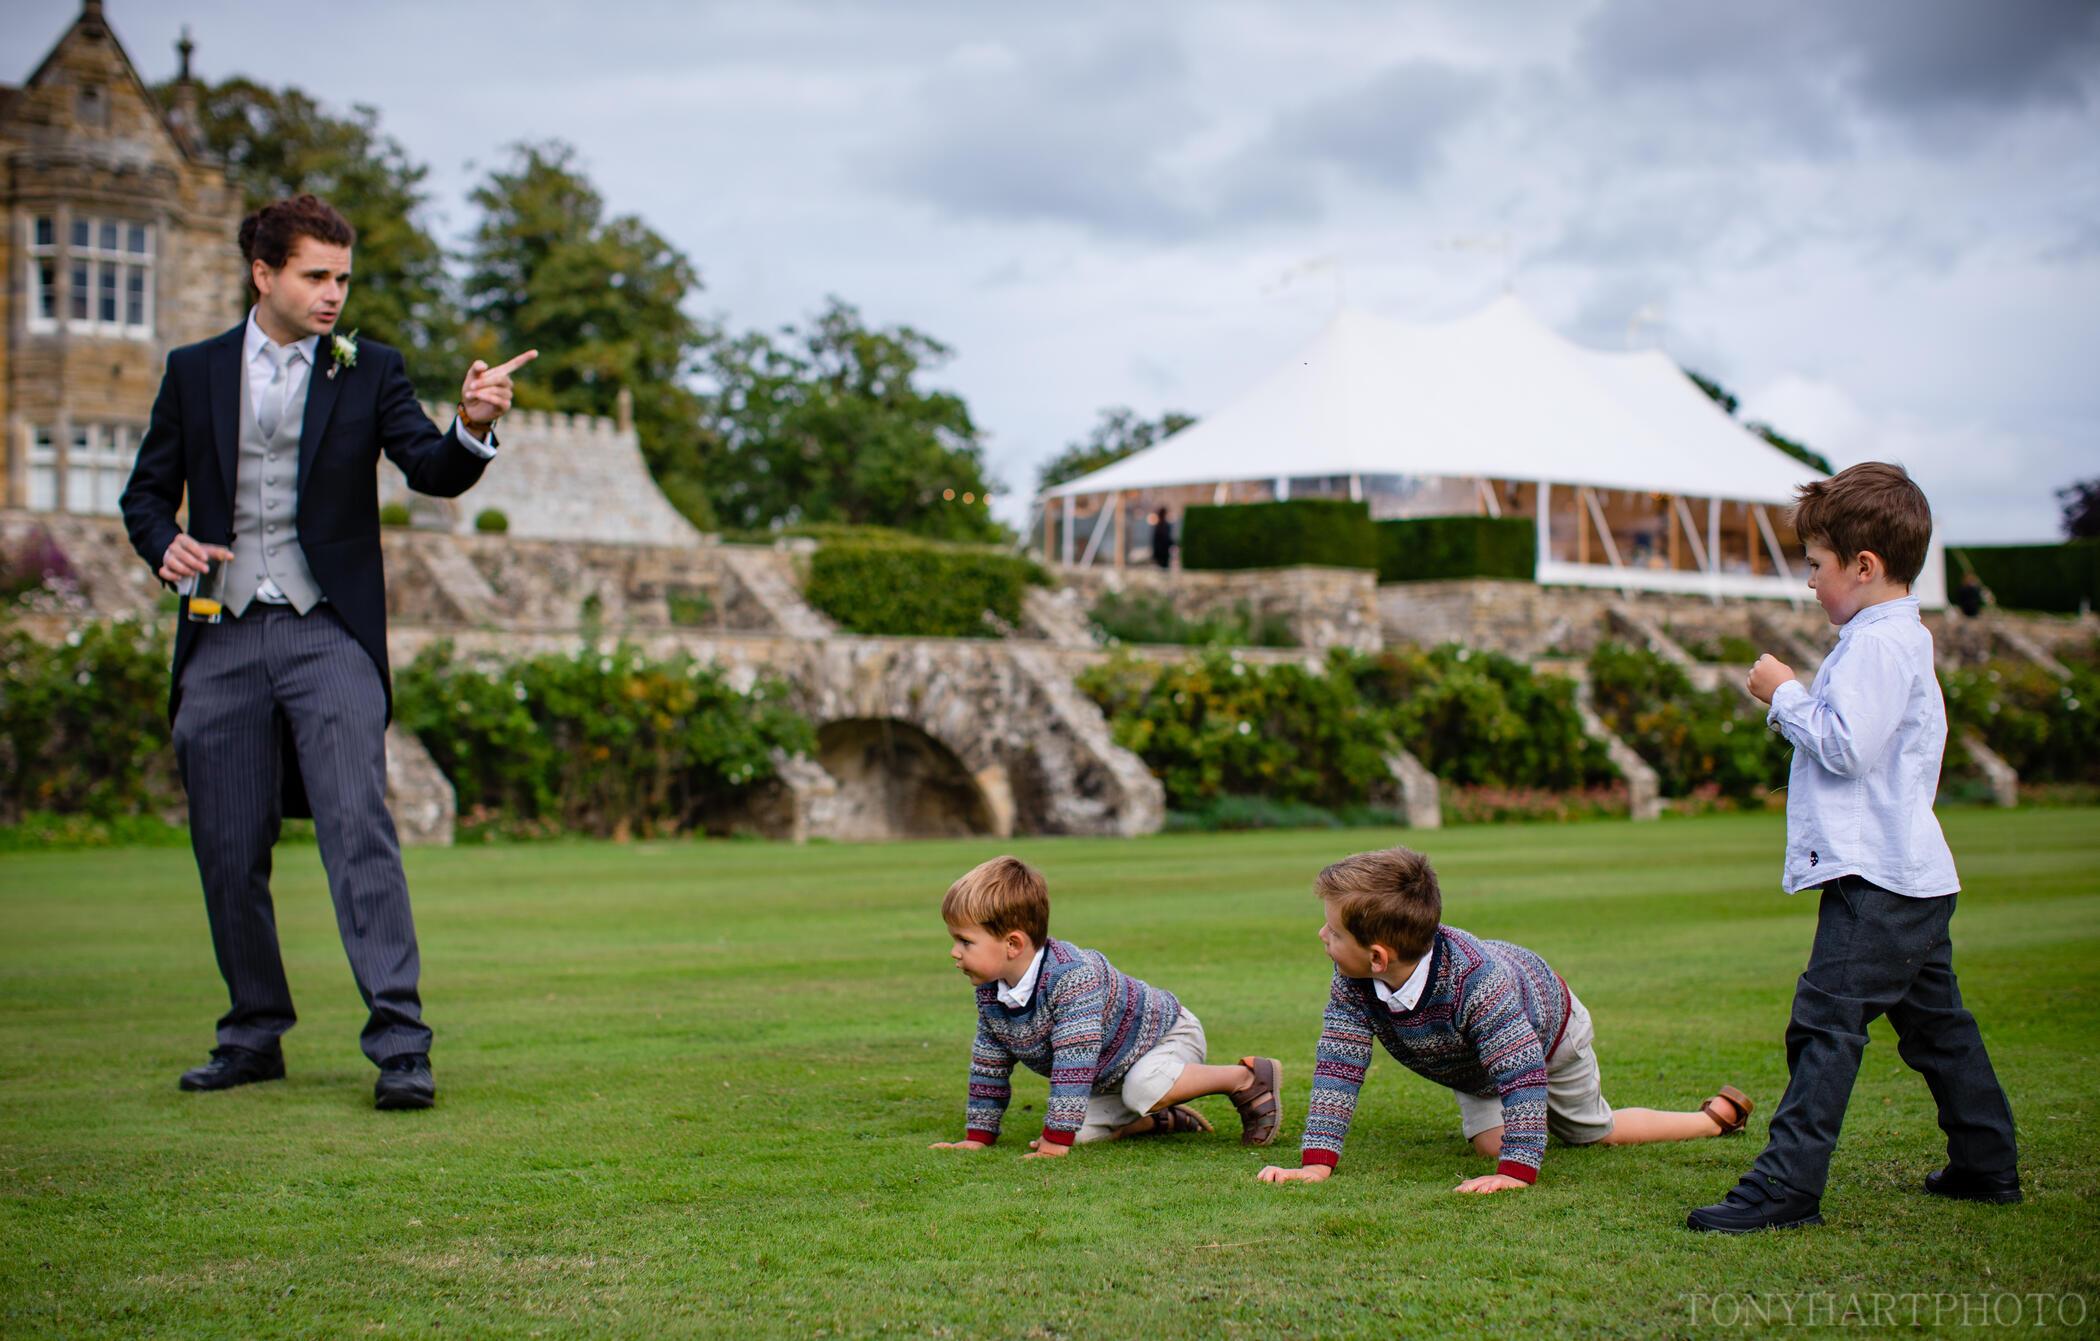 Buckhurst Park wedding photography by Tony Hart